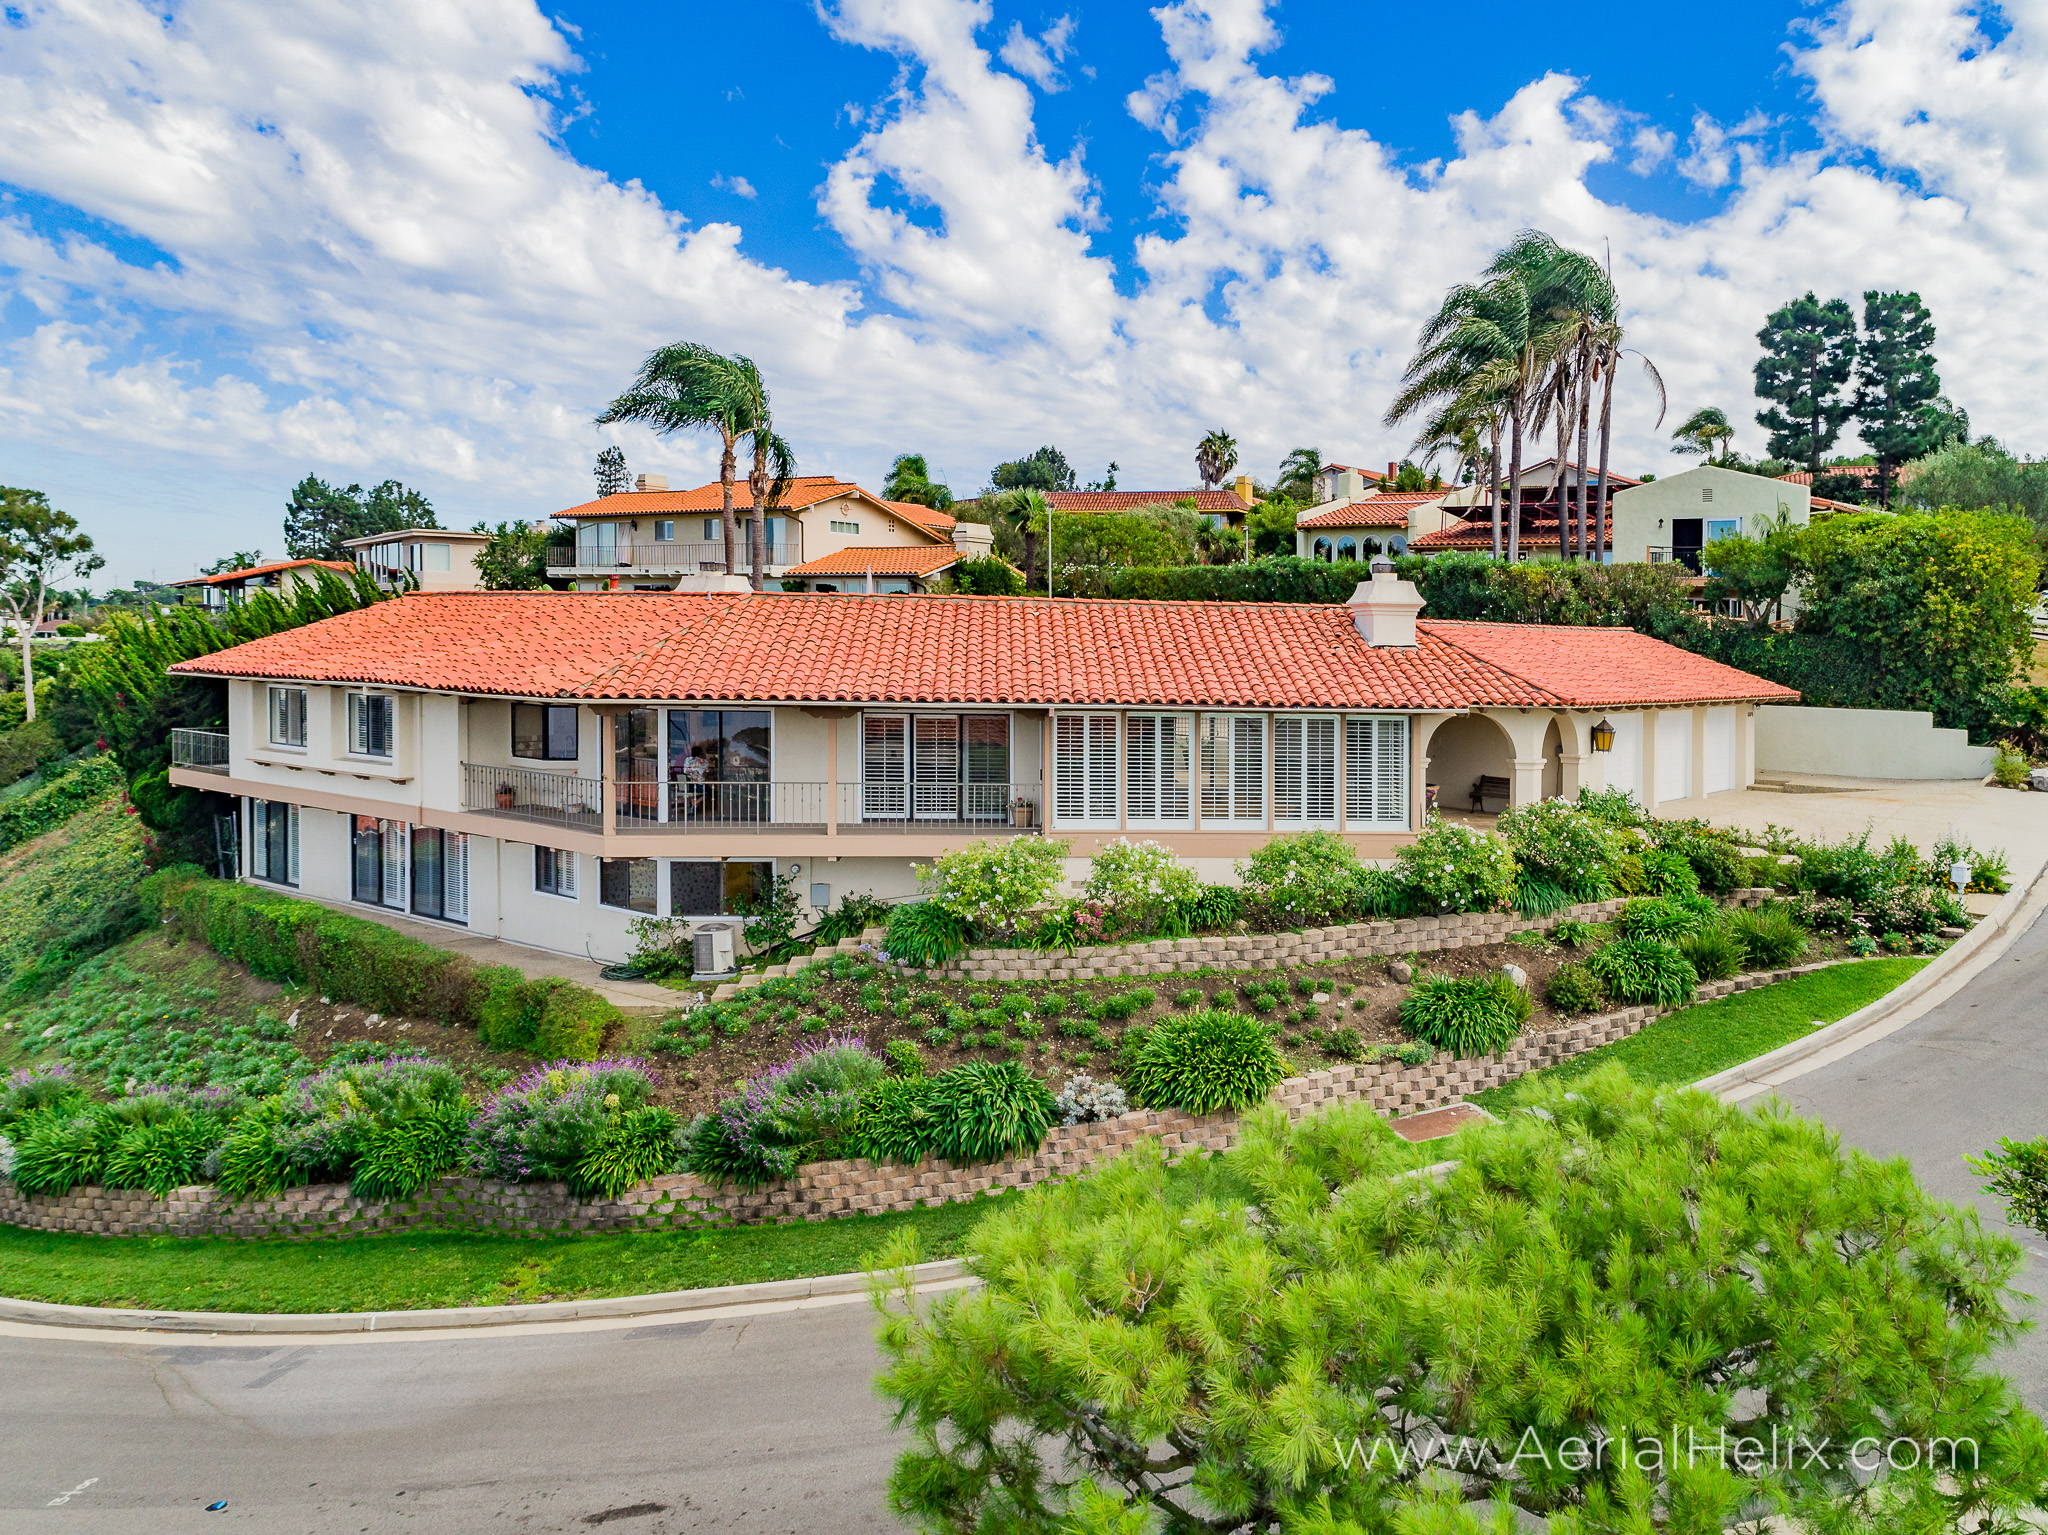 Woodfern Drive - HELIX Real Estate Aerial Photographer-9.jpg